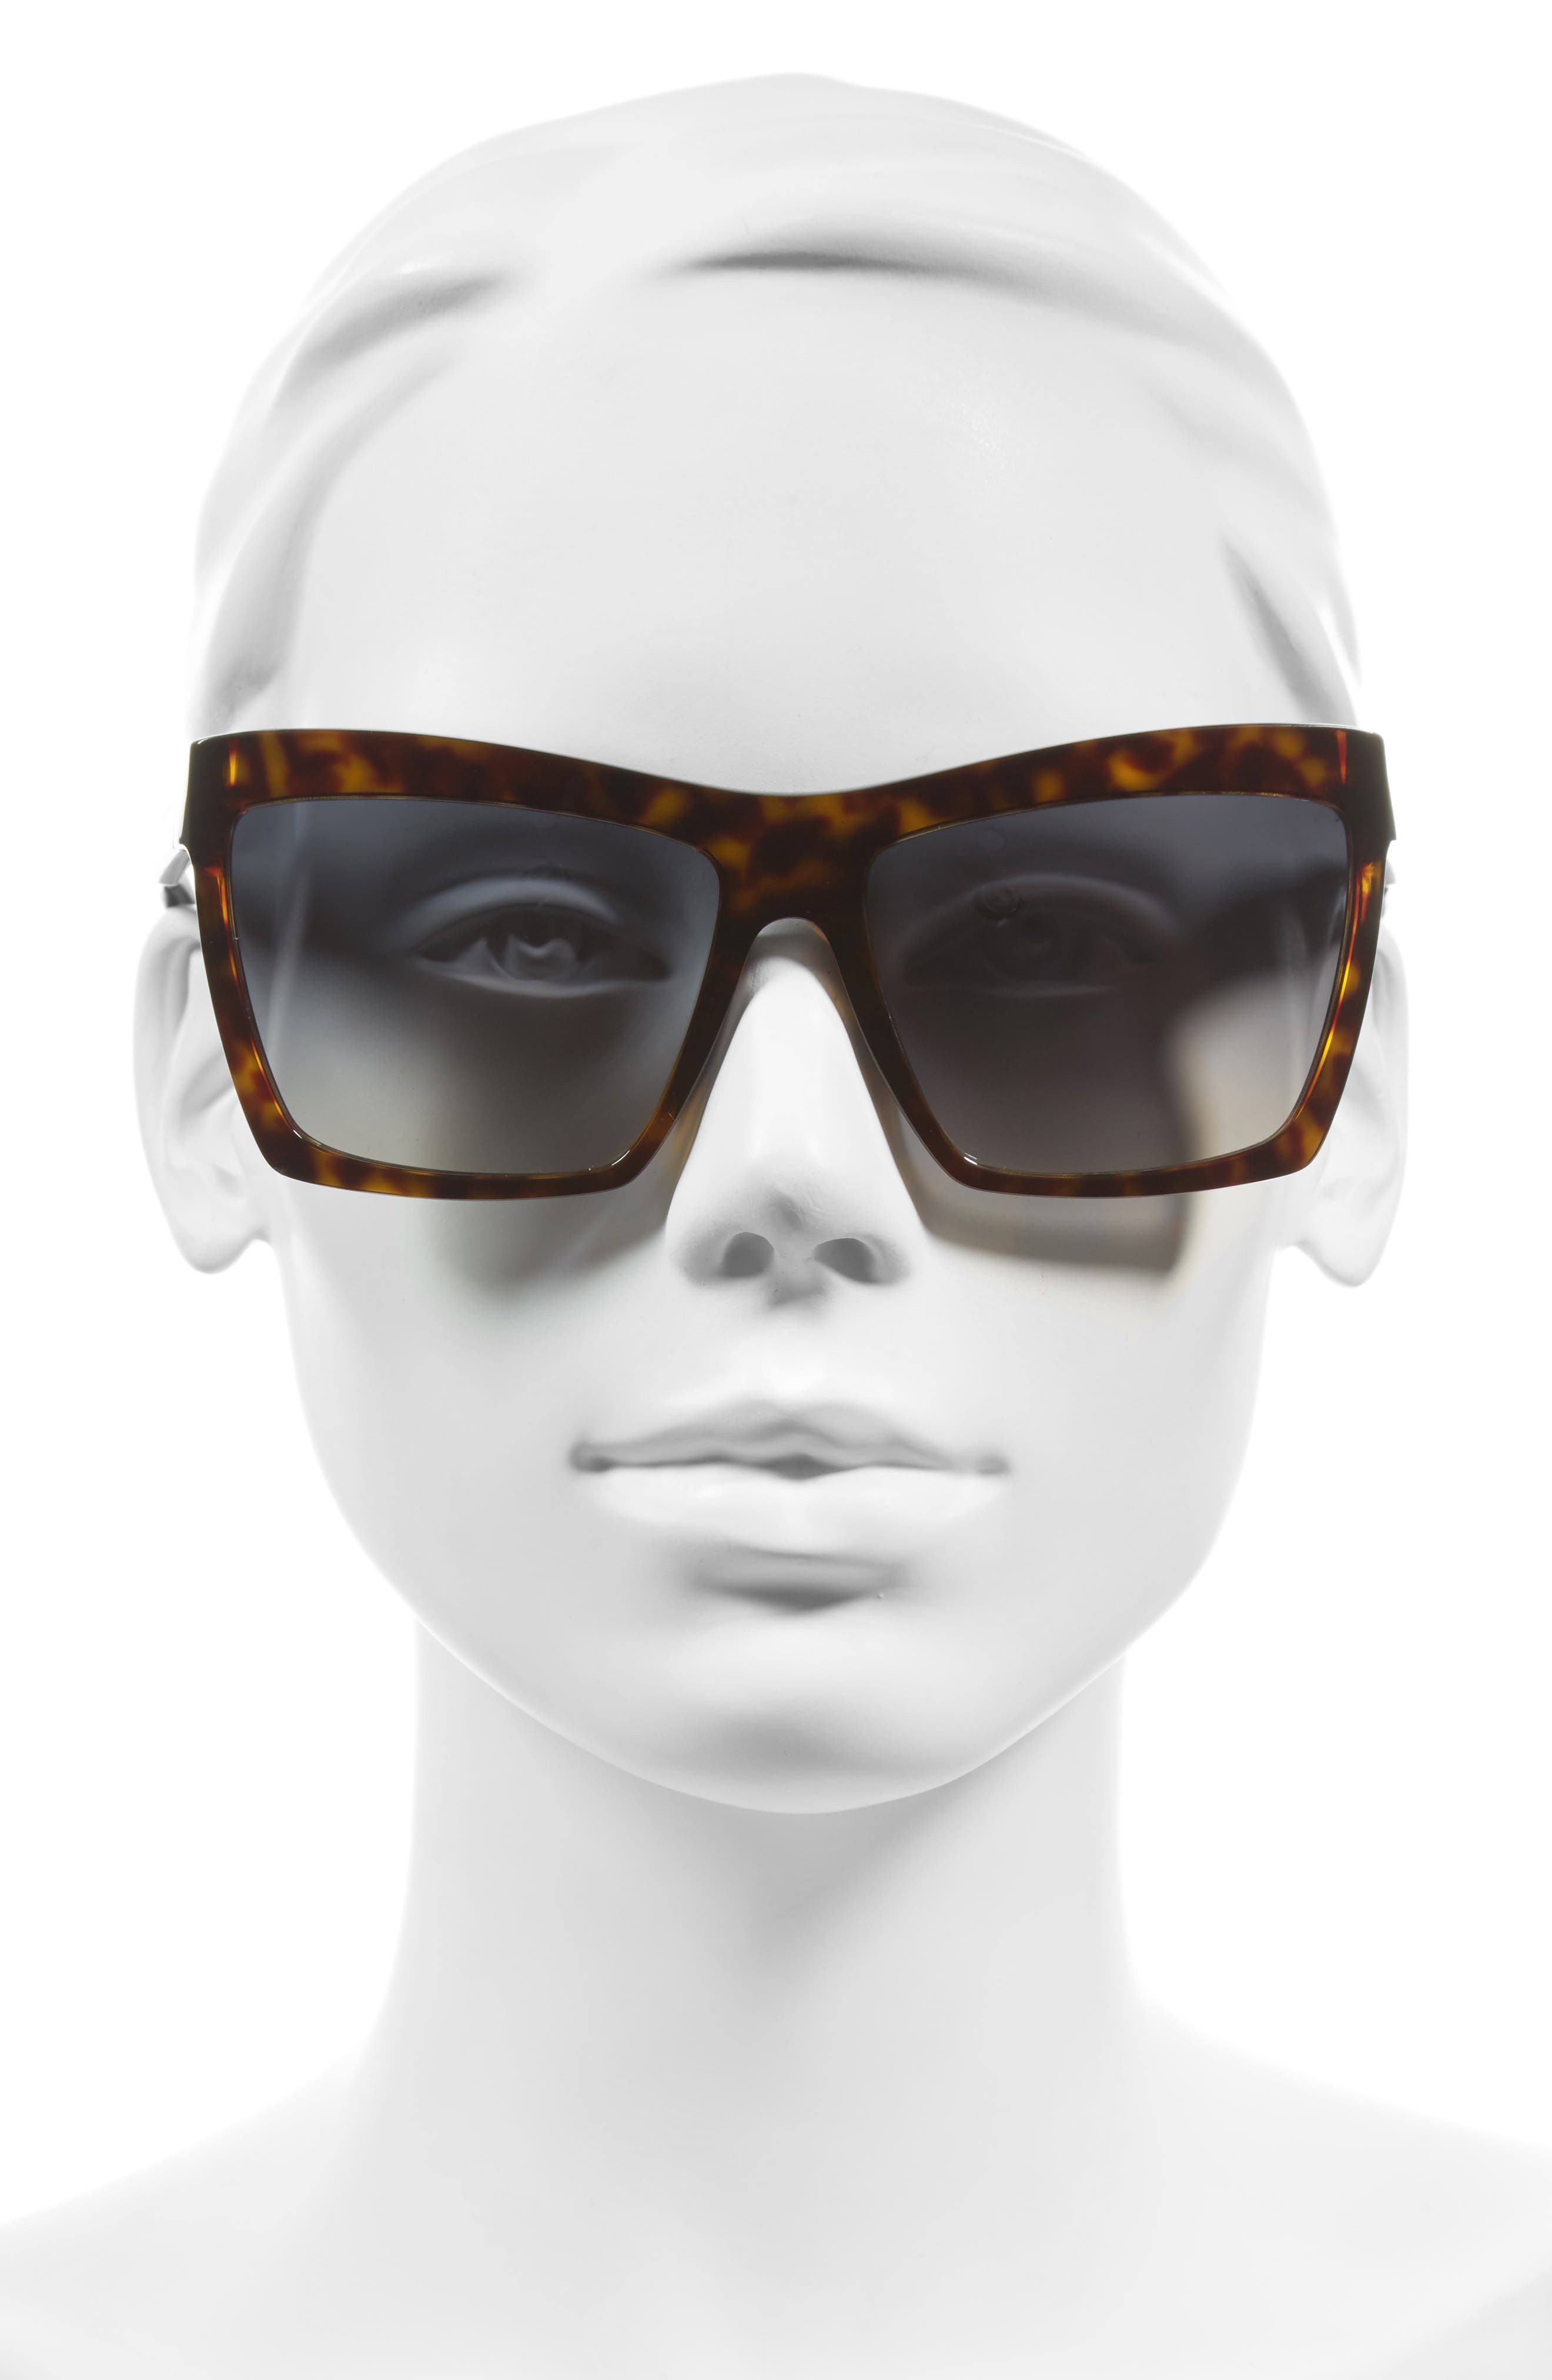 60mm Oversize Sunglasses,                             Alternate thumbnail 2, color,                             Havana/ Black/ Flash Azure